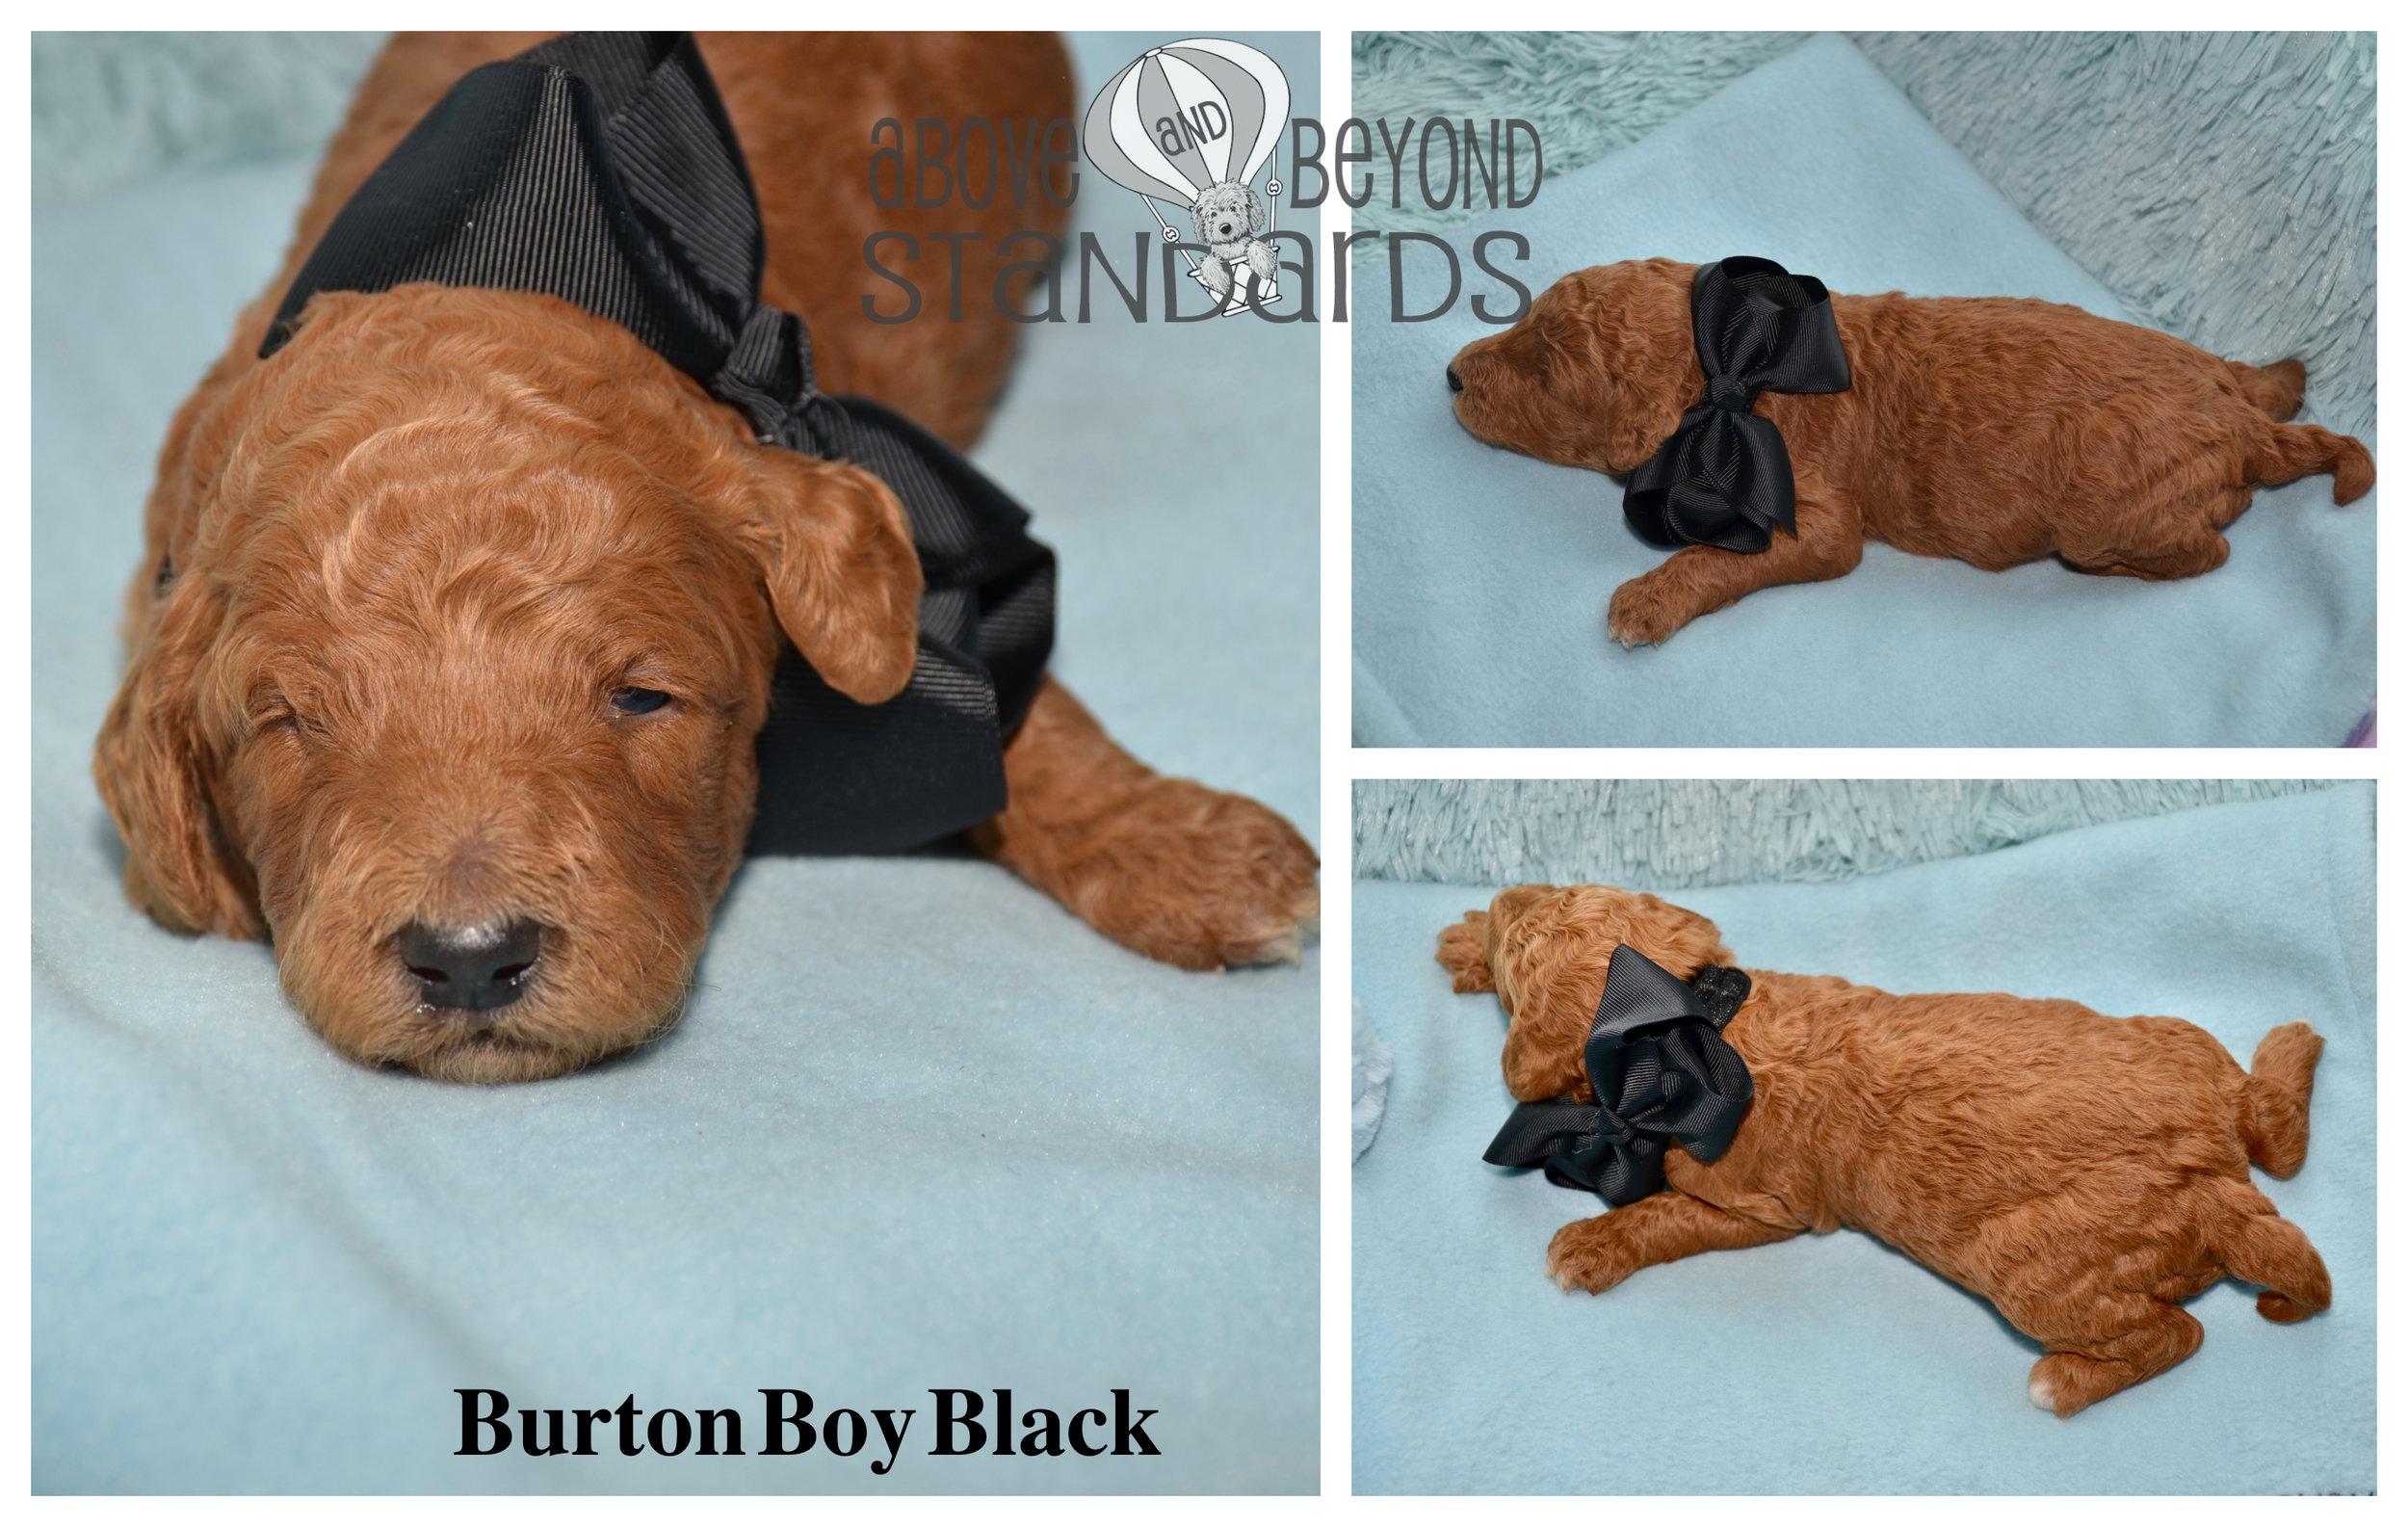 Burton Boy Black - EMILIE & CRUSHER STANDARD POODLE FEBRUARY 2ND, 2019.jpg